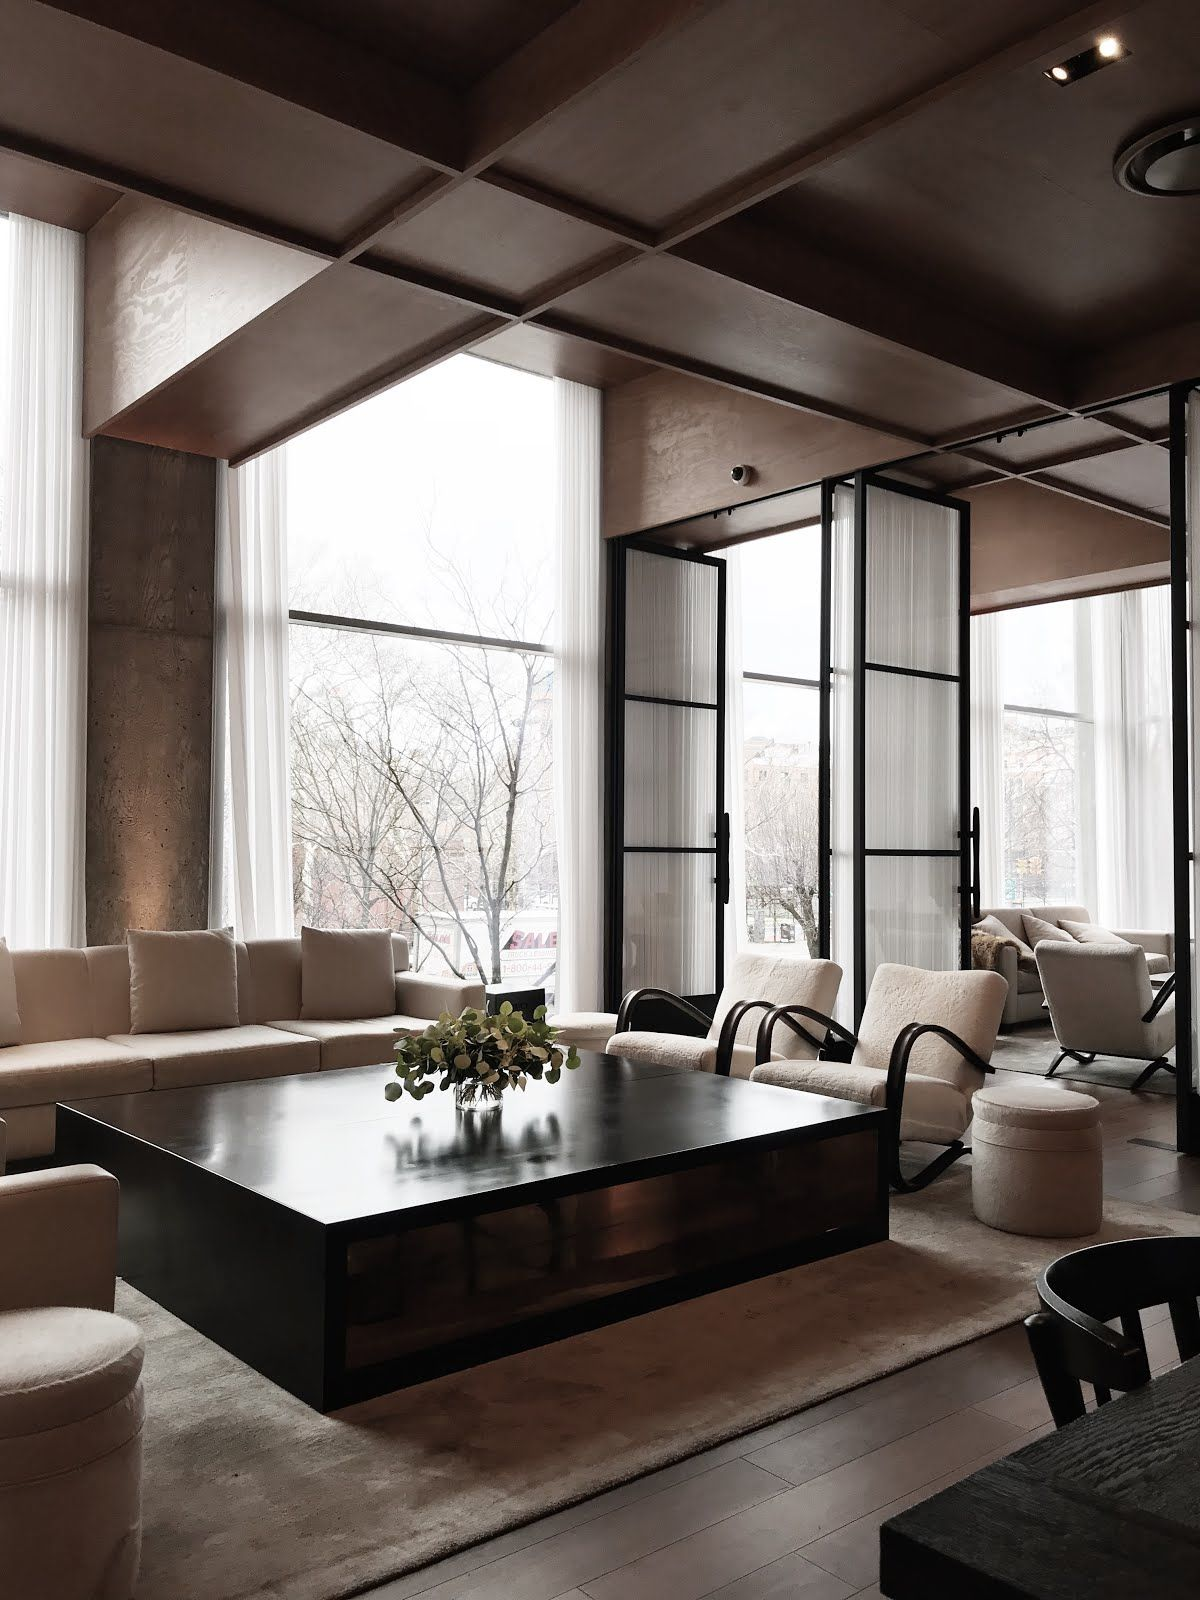 NYC Public Hotel   Craft and Couture   Luxus wohnzimmer, Wohn ...